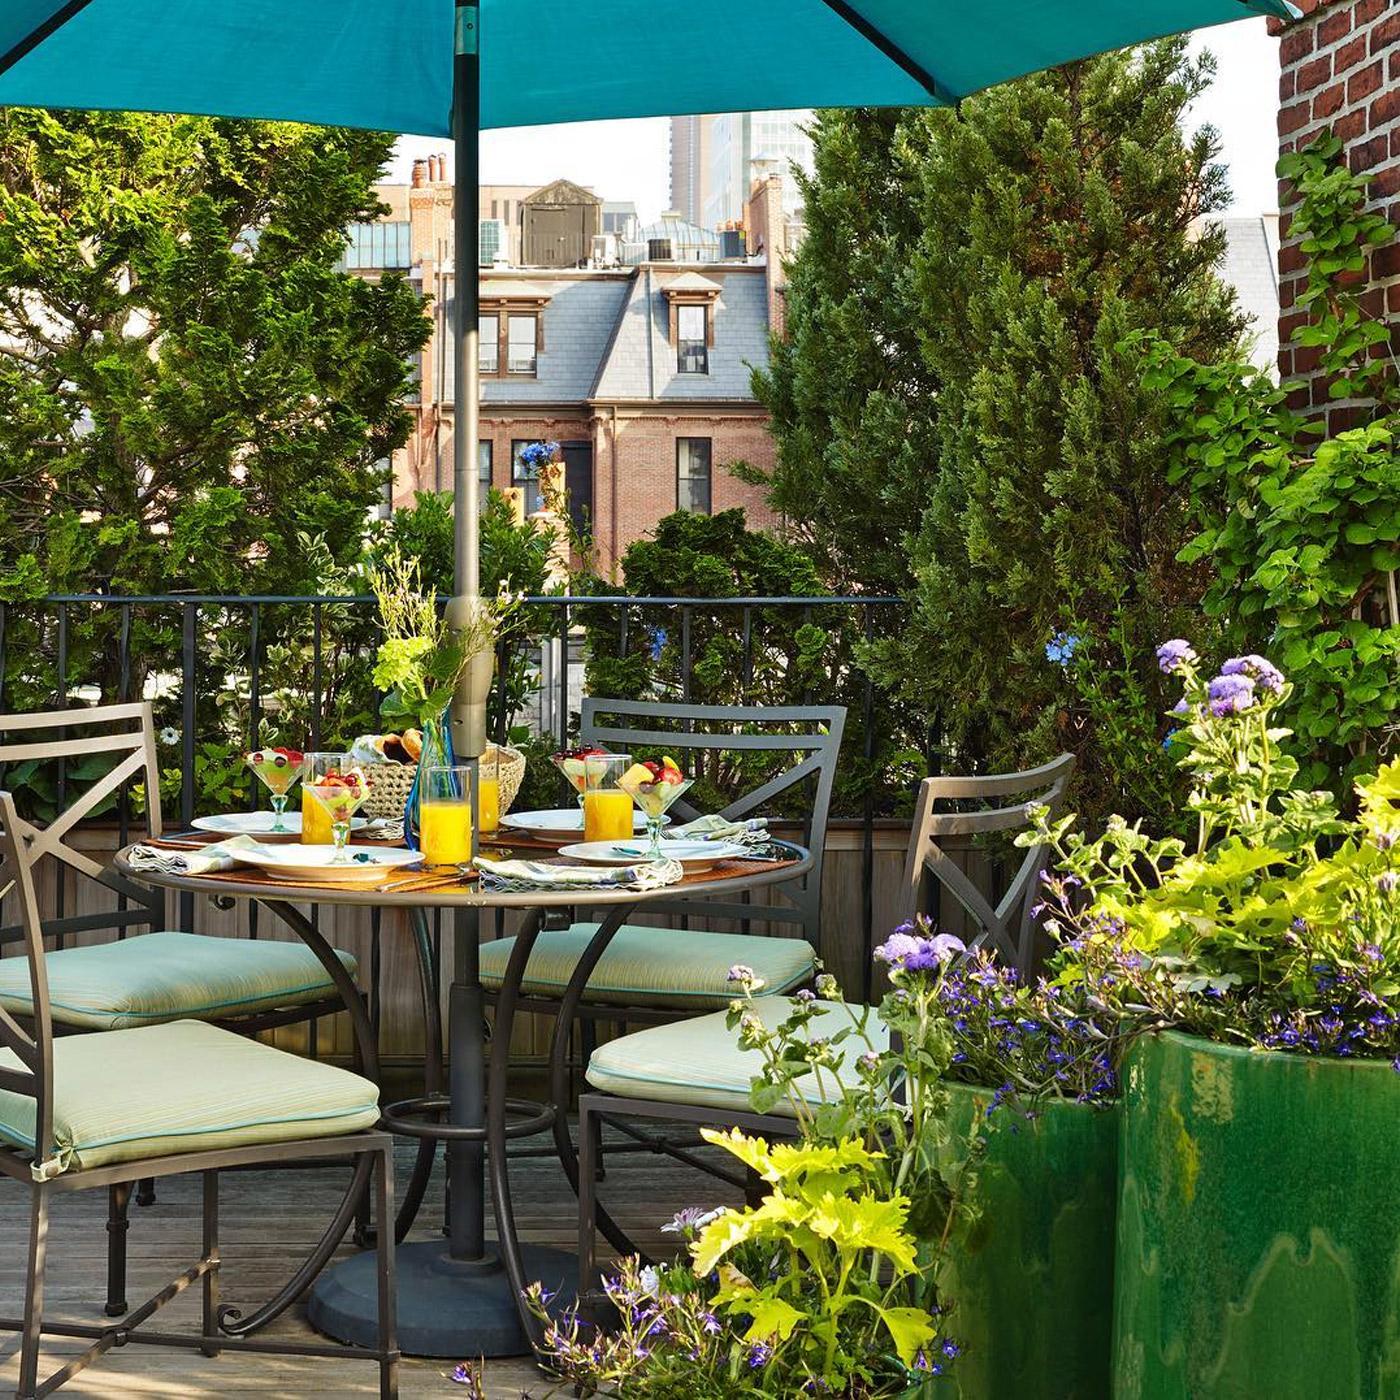 brown jordan furniture in boston back bay rooftop garden